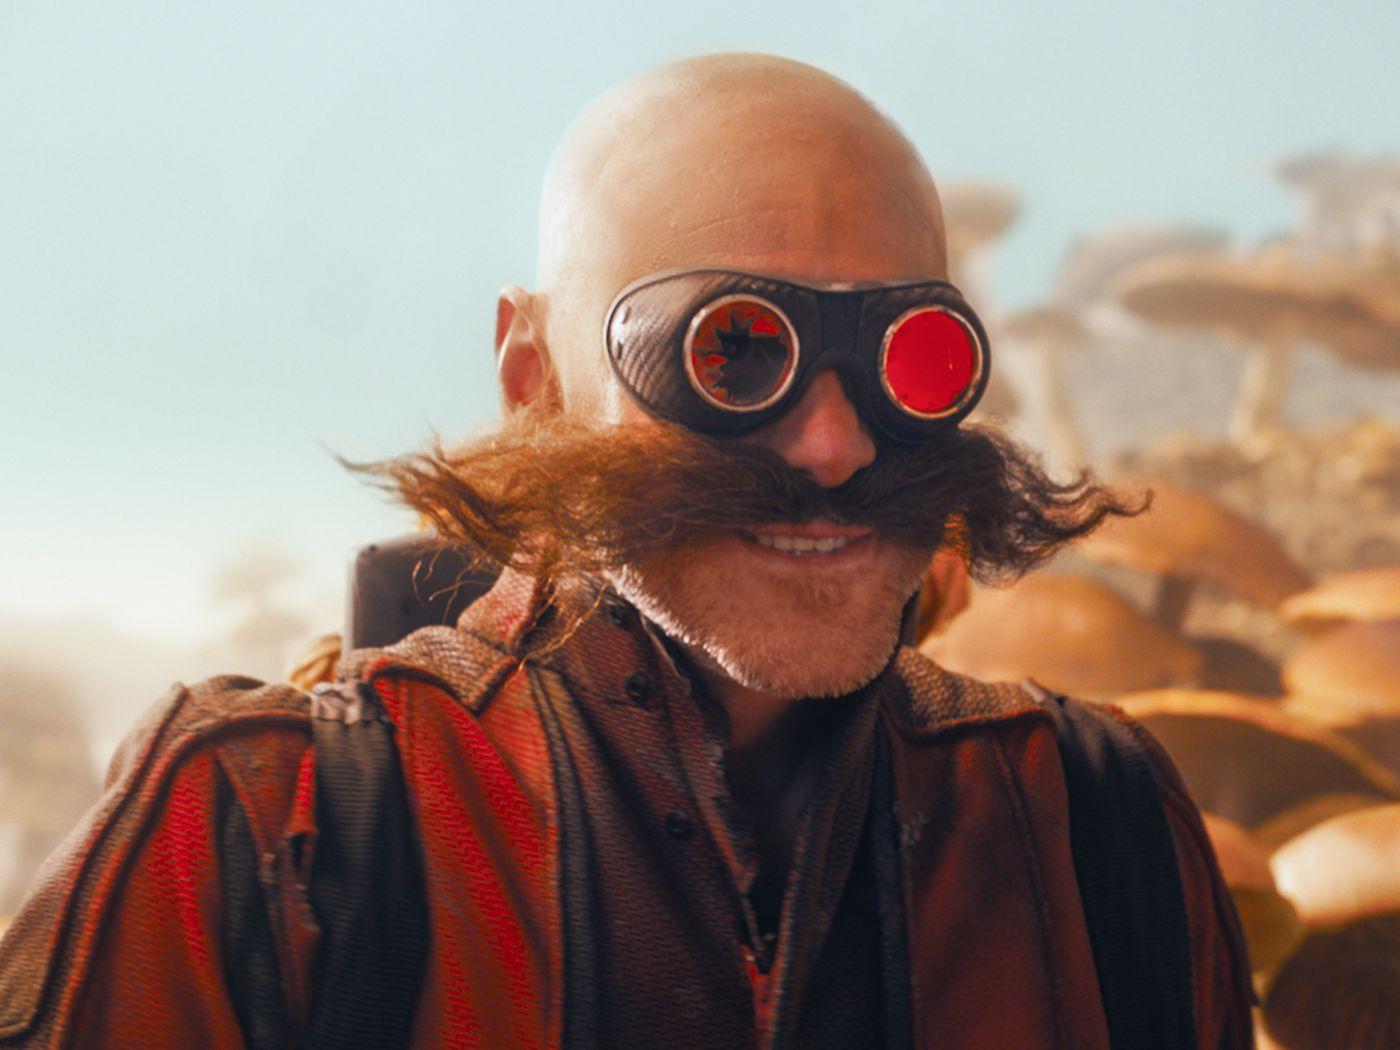 Dr Robotnik Vs Eggman Why Fans Debate Sonic The Hedgehog S Villain Polygon